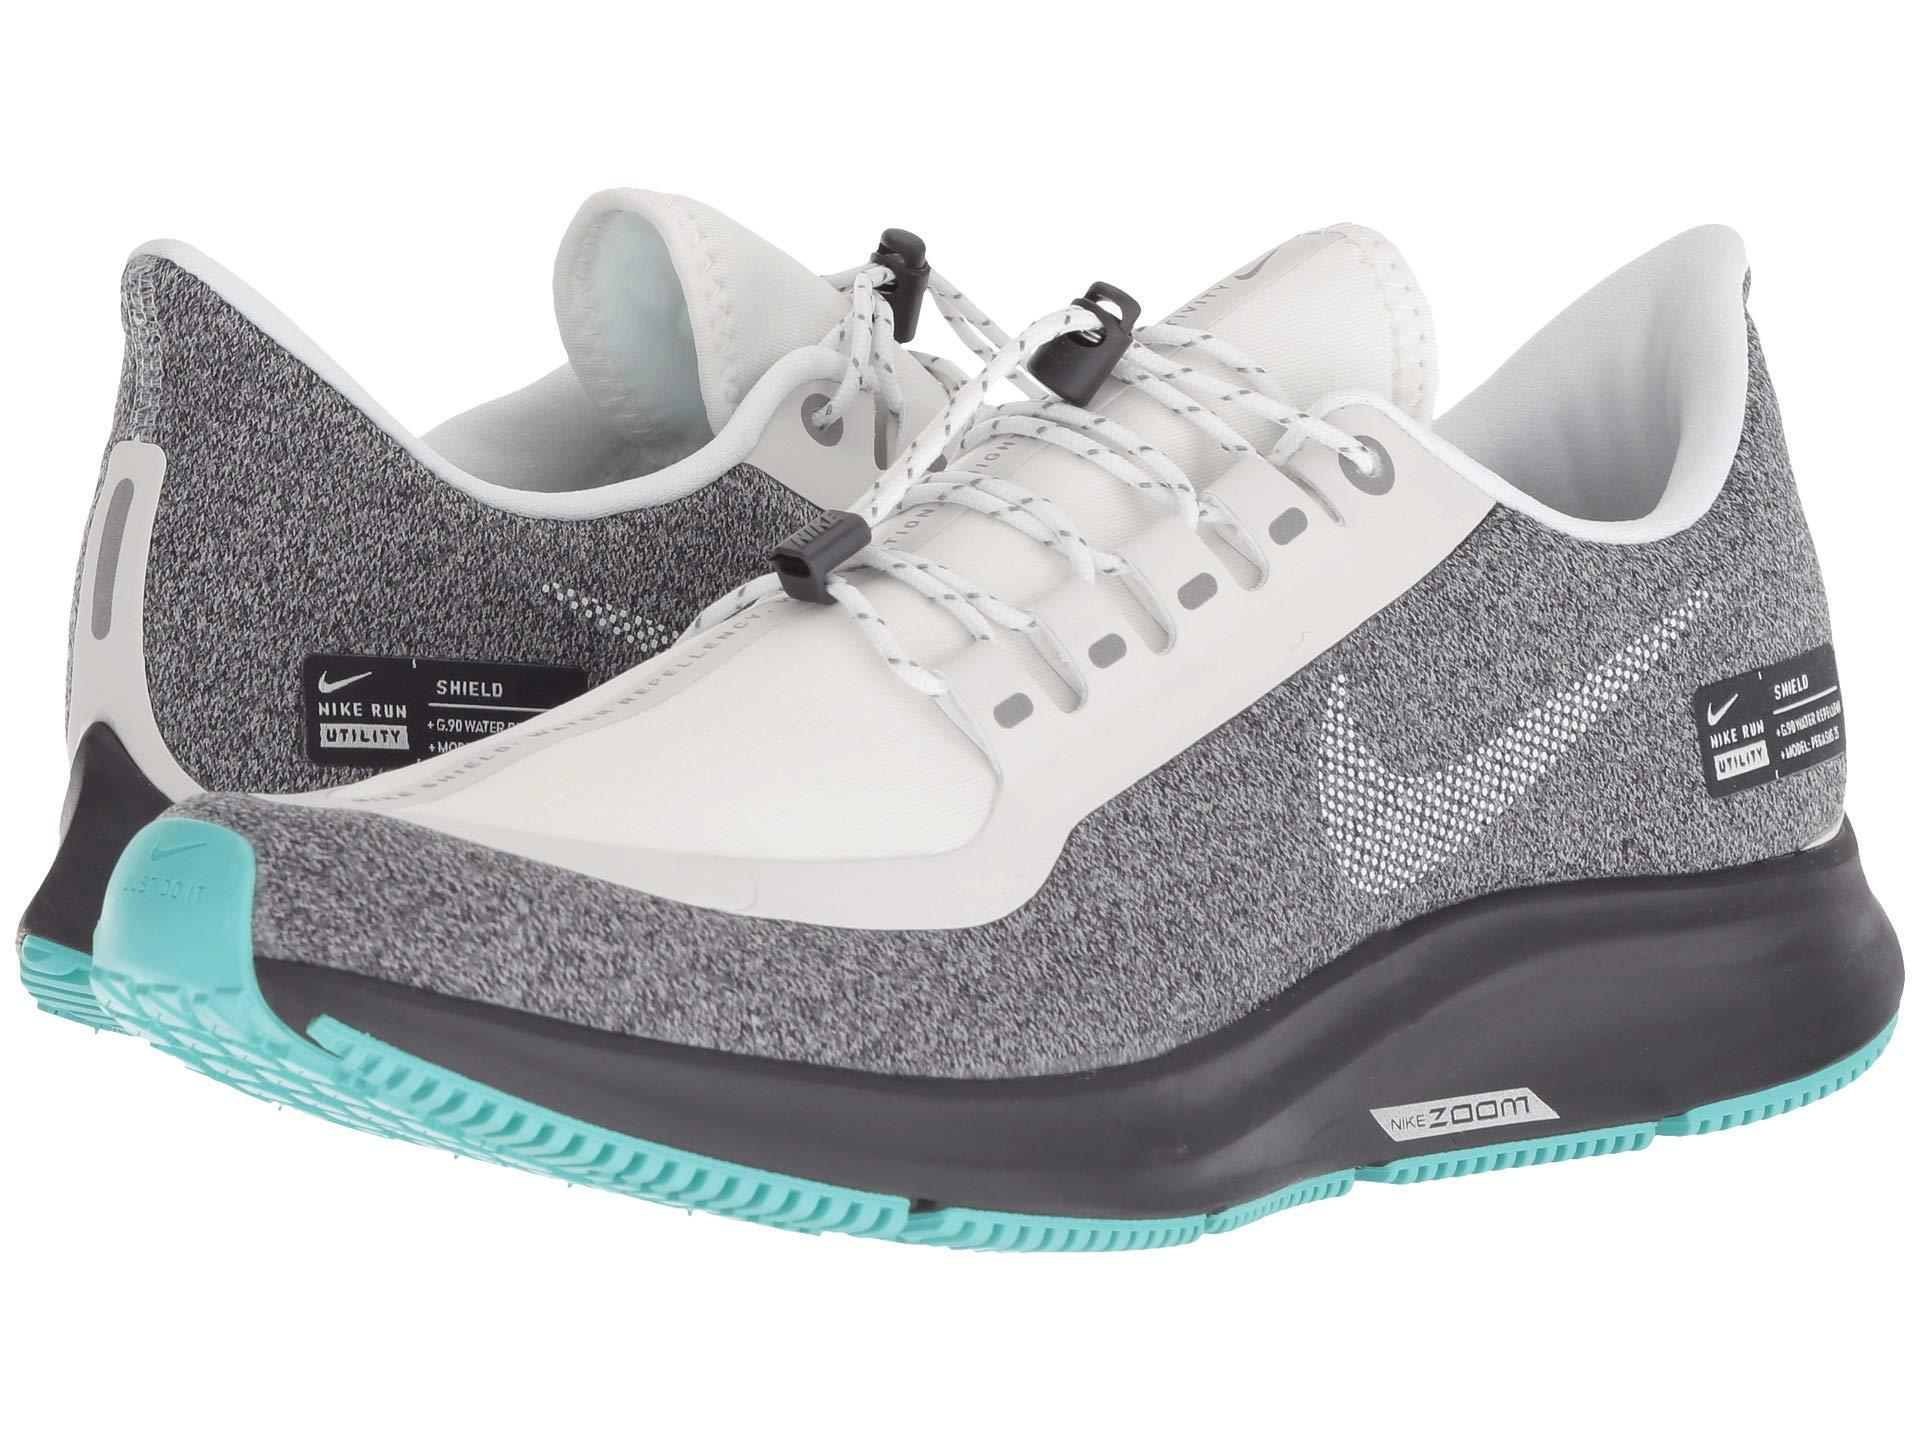 0ab4f845c9c4 Nike. Air Zoom Pegasus 35 Shield (oil Grey metallic Silver smokey Mauve) Women s  Running Shoes